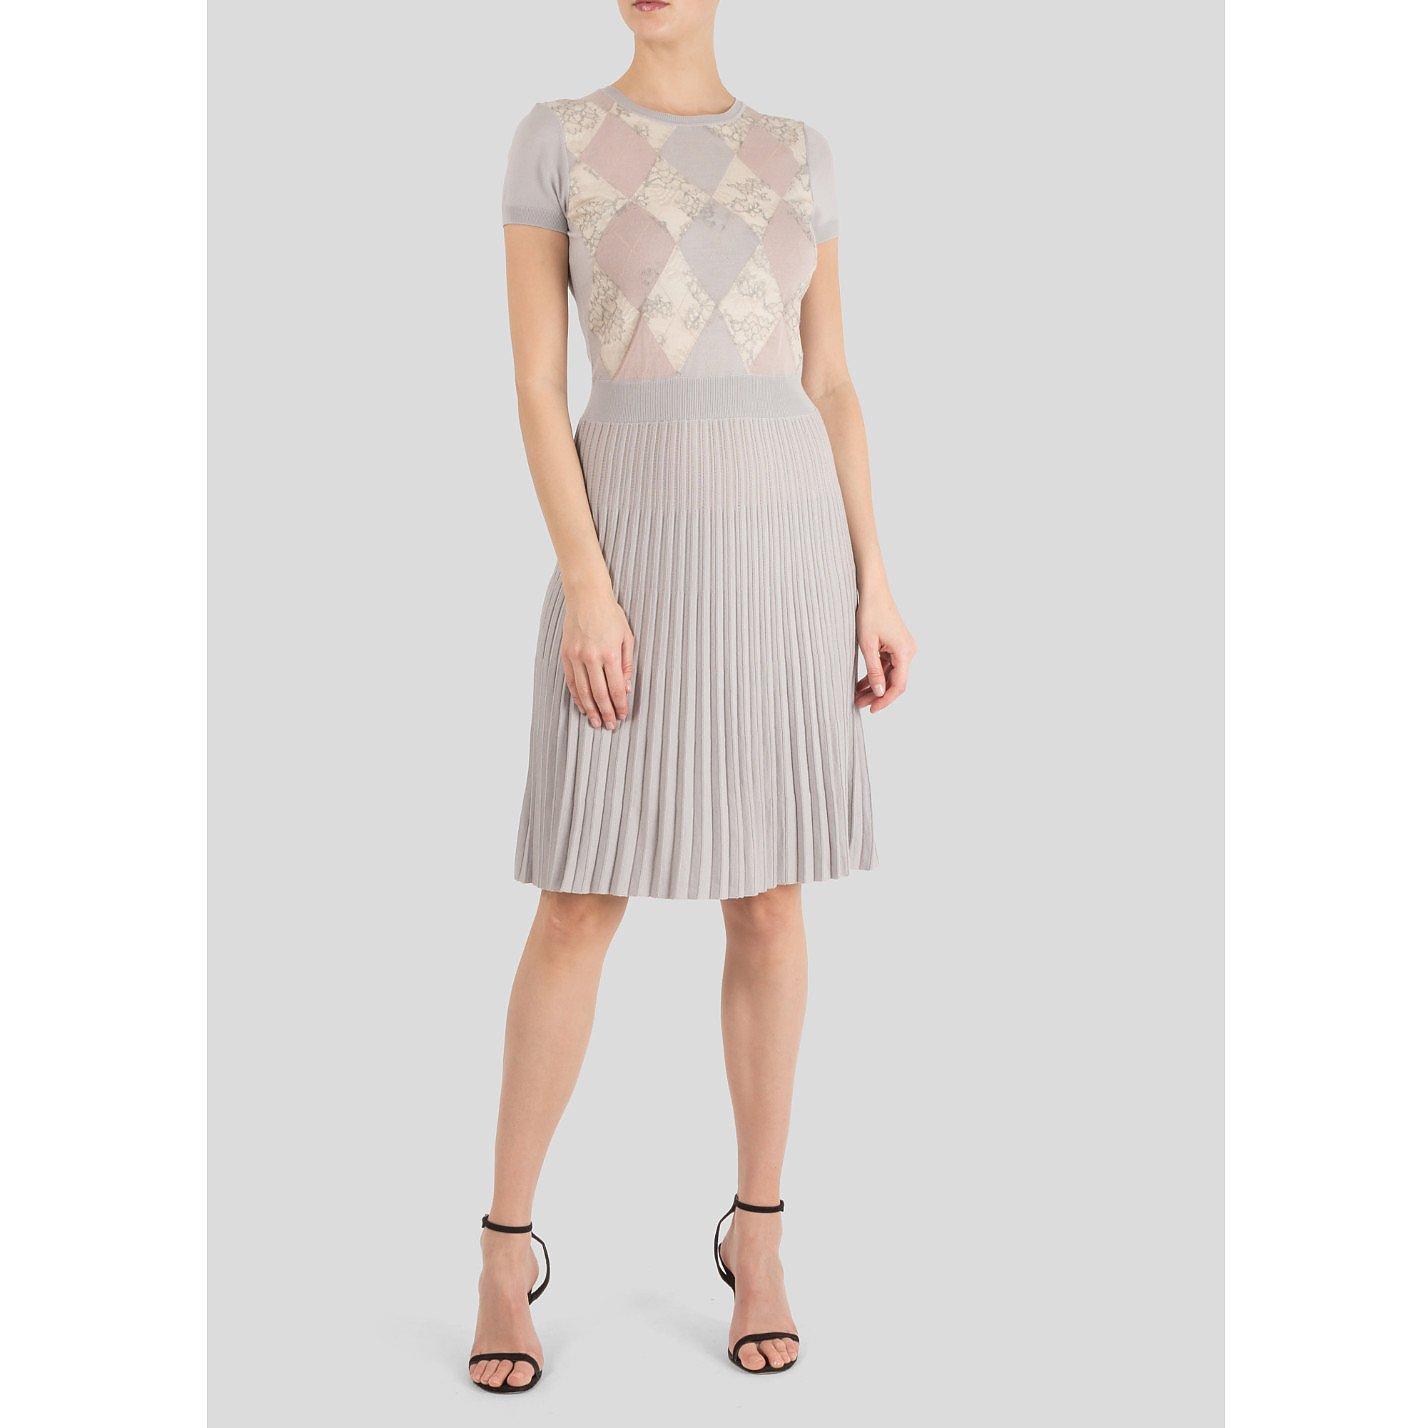 Valentino Argyle Knit Print Dress